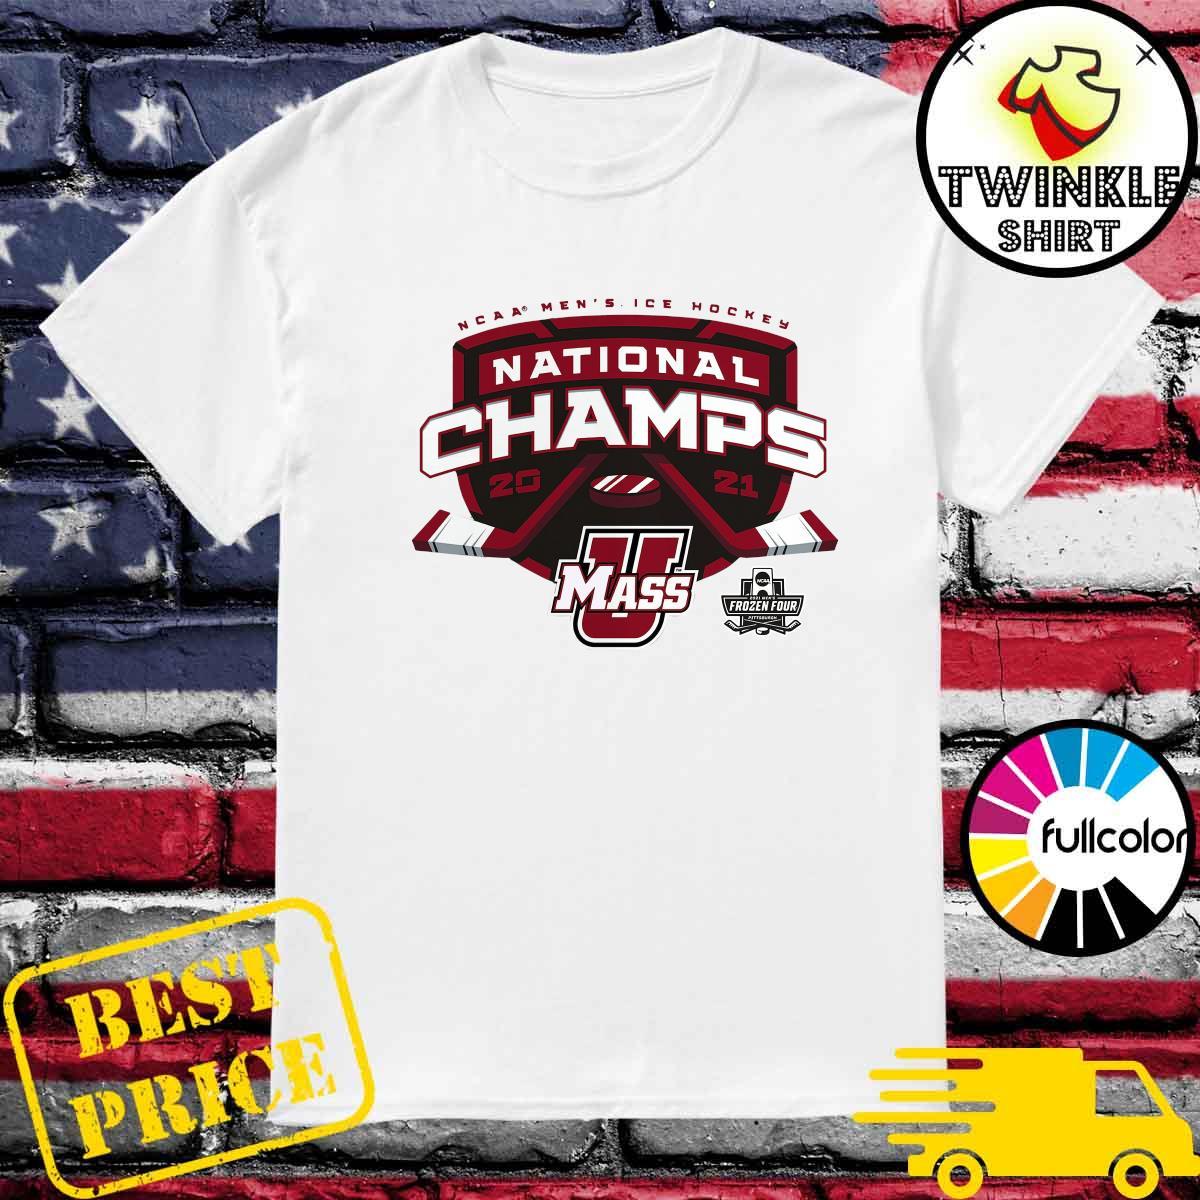 Official UMass Minutemen 2021 NCAA Men's Ice Hockey National Champions T-Shirt